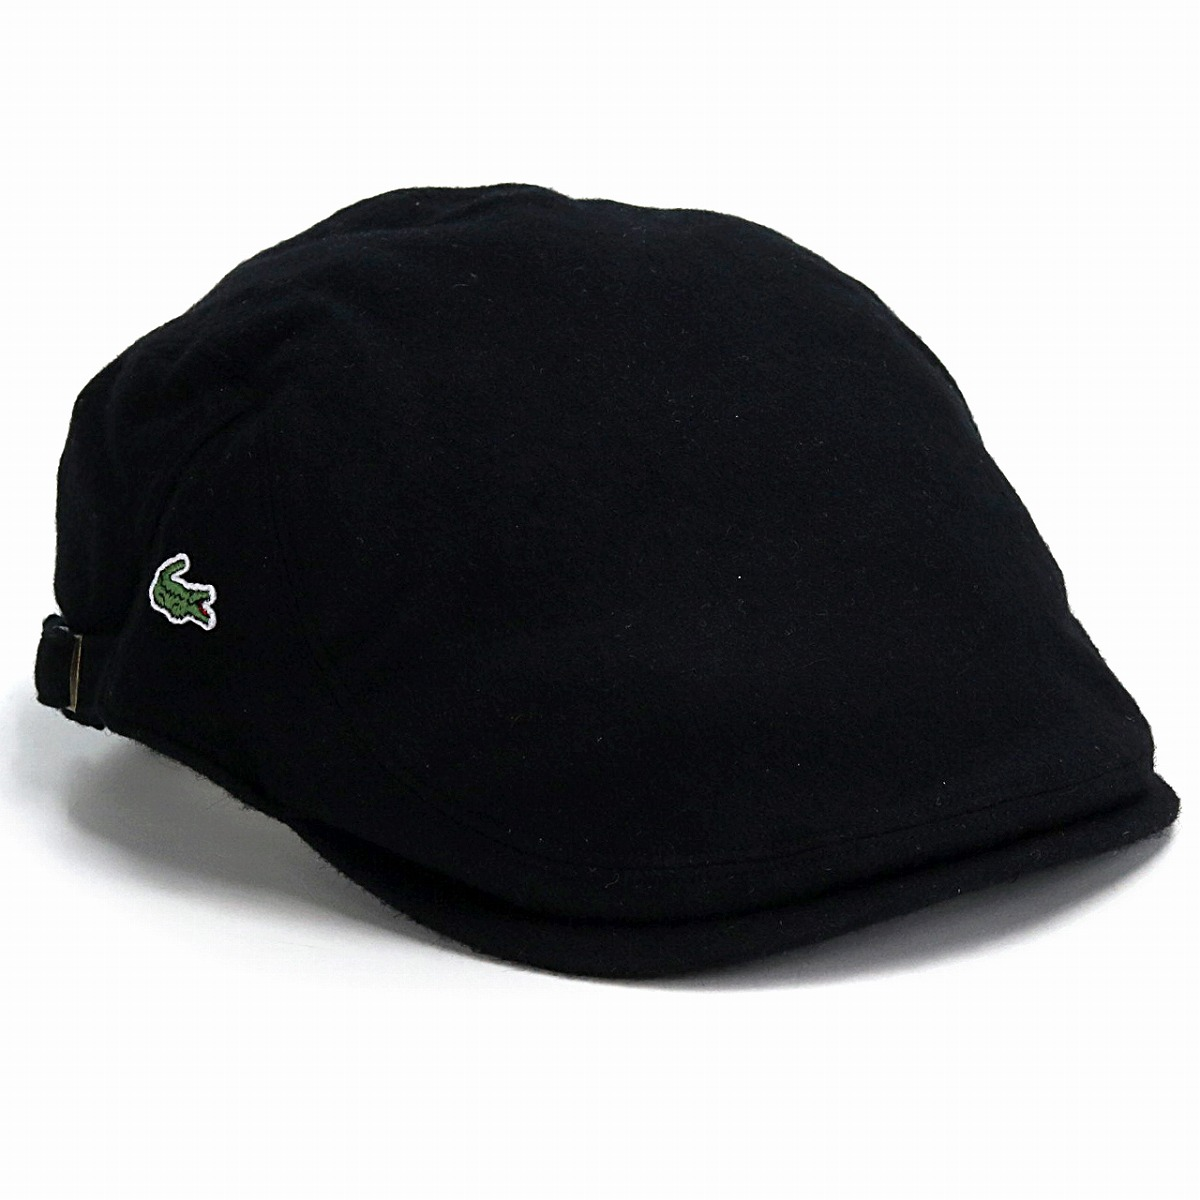 Wool hunting cap crocodile brand sports lacoste hunting cap hat Lady s ivy  cap Shin pull plain ... 398a7b0e4d26